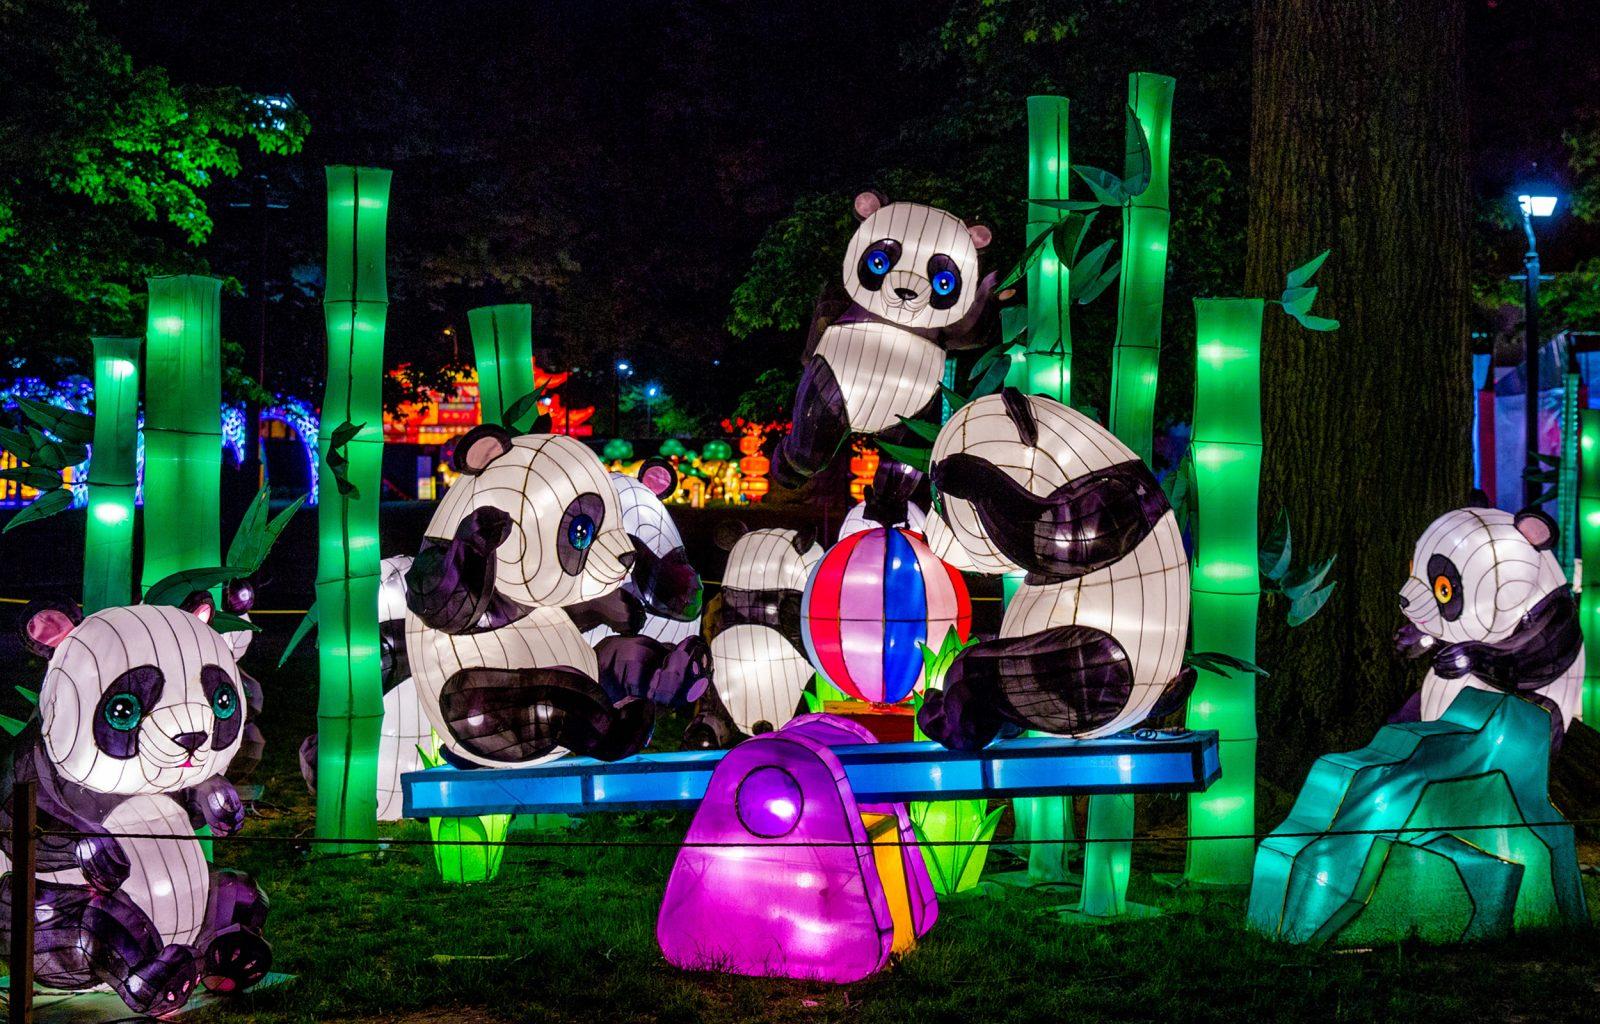 Moonlight Forest Panda Lanterns